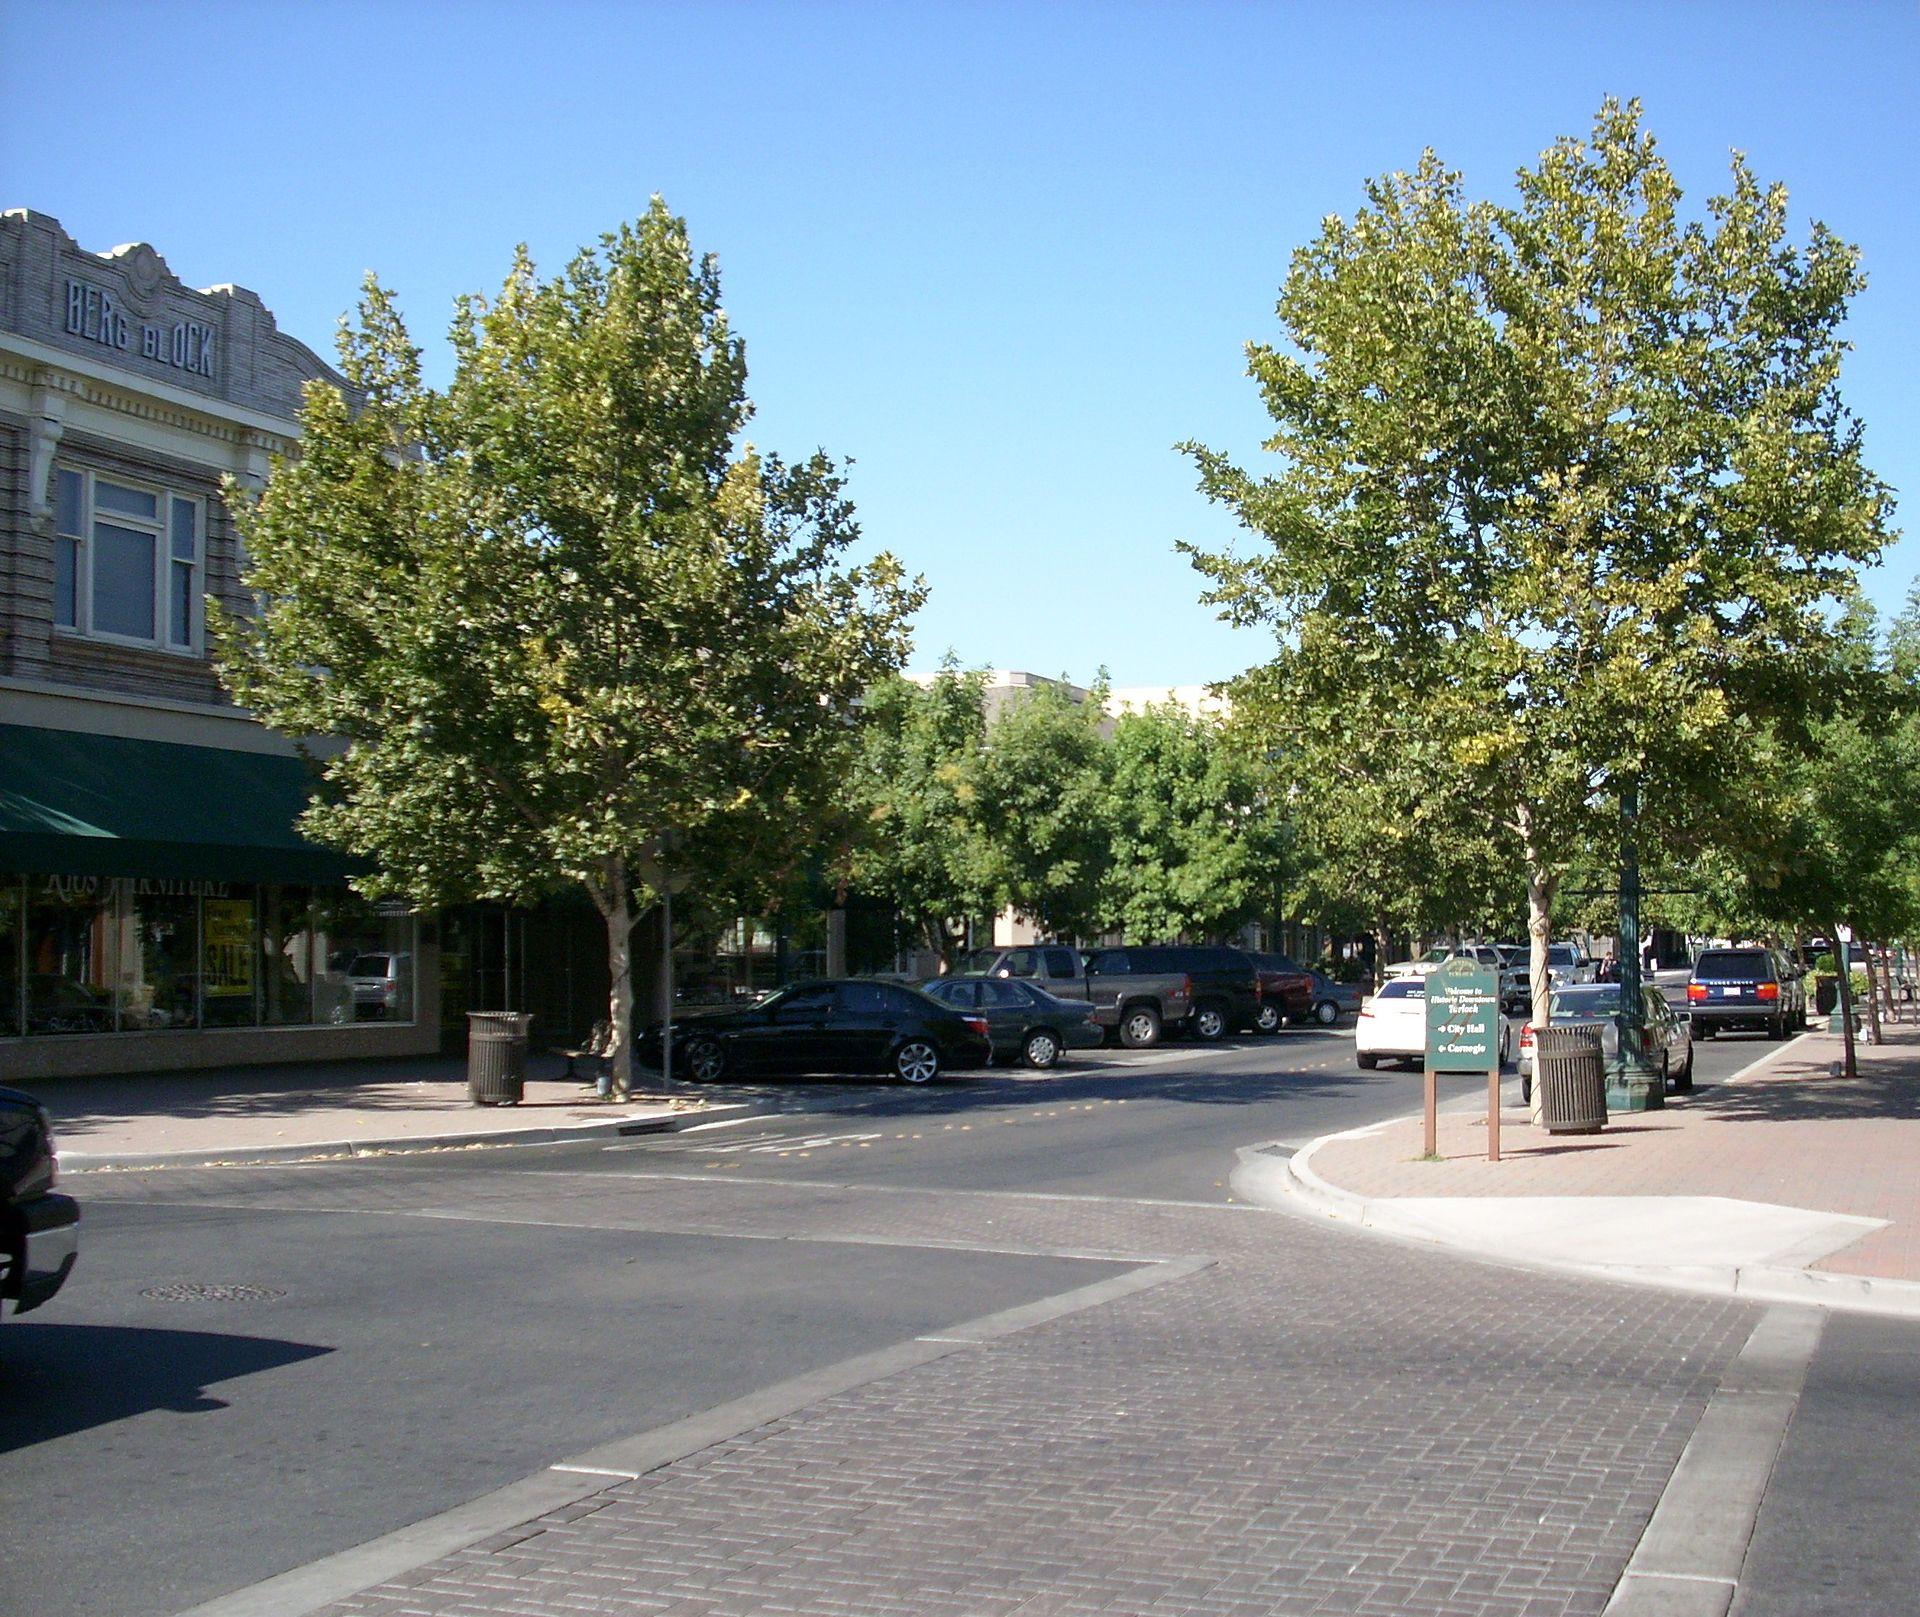 Turlock, California - ...